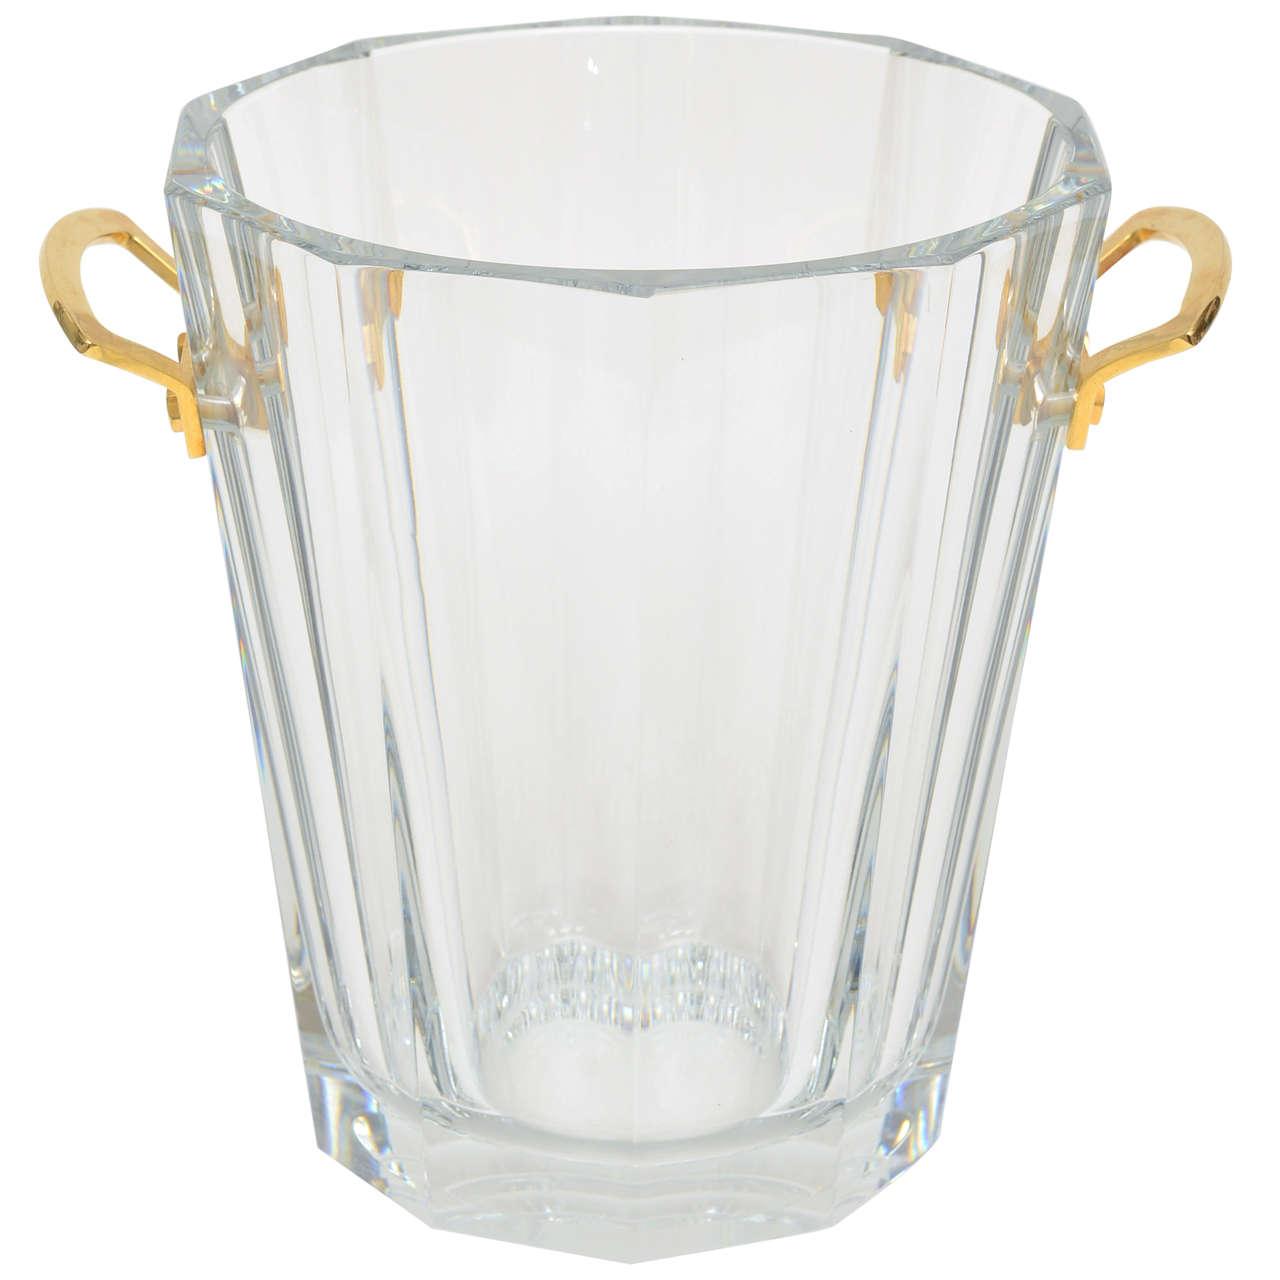 rare maxim vintage french crystal bronze baccarat champagne or  - rare maxim vintage french crystal bronze baccarat champagne or ice bucket